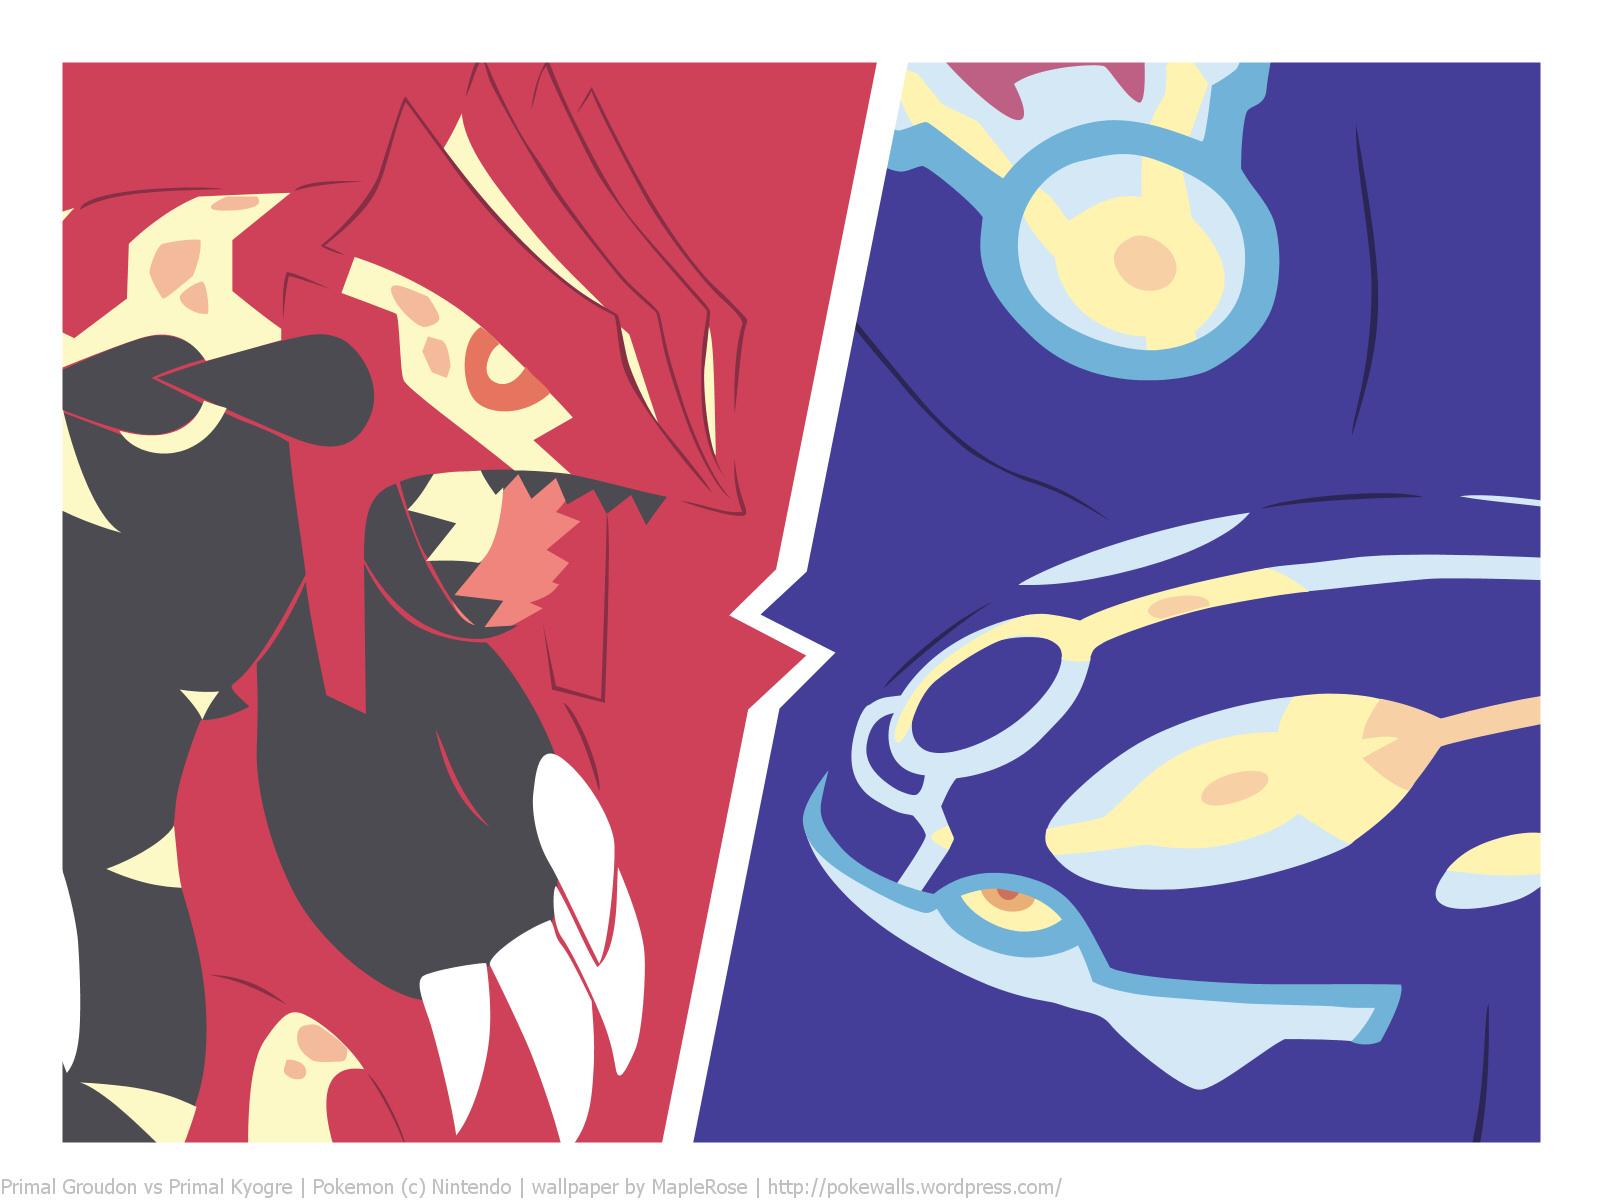 Primal Kyogre Wallpaper pokéwalls | gotta wall 'em all! a pokémon wallpaper blog | page 8